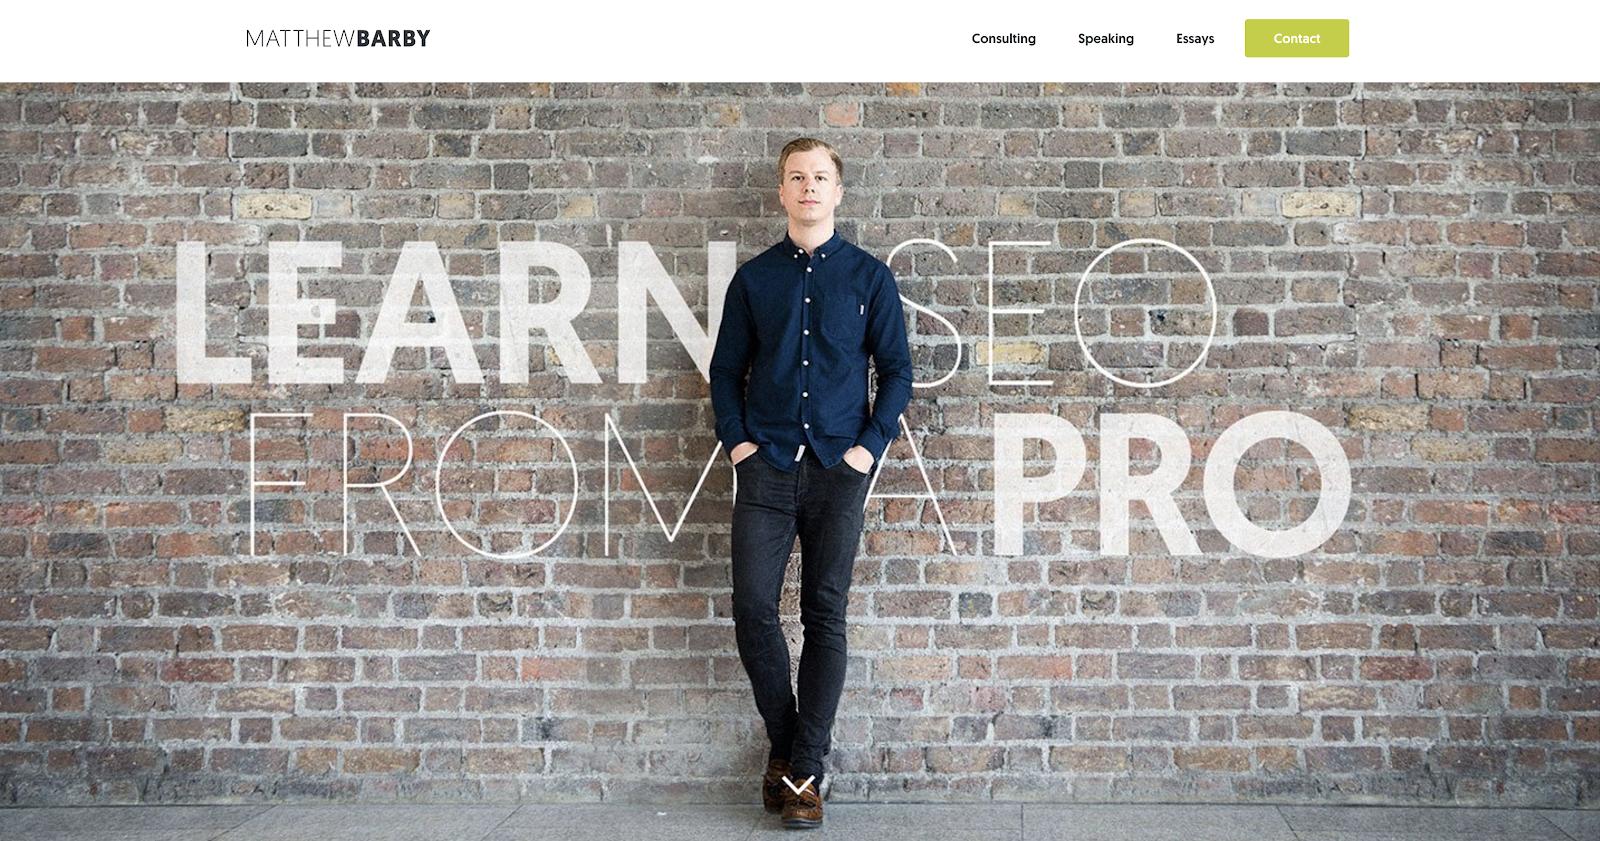 Matthew Barby homepage screengrab from freelancer seo website